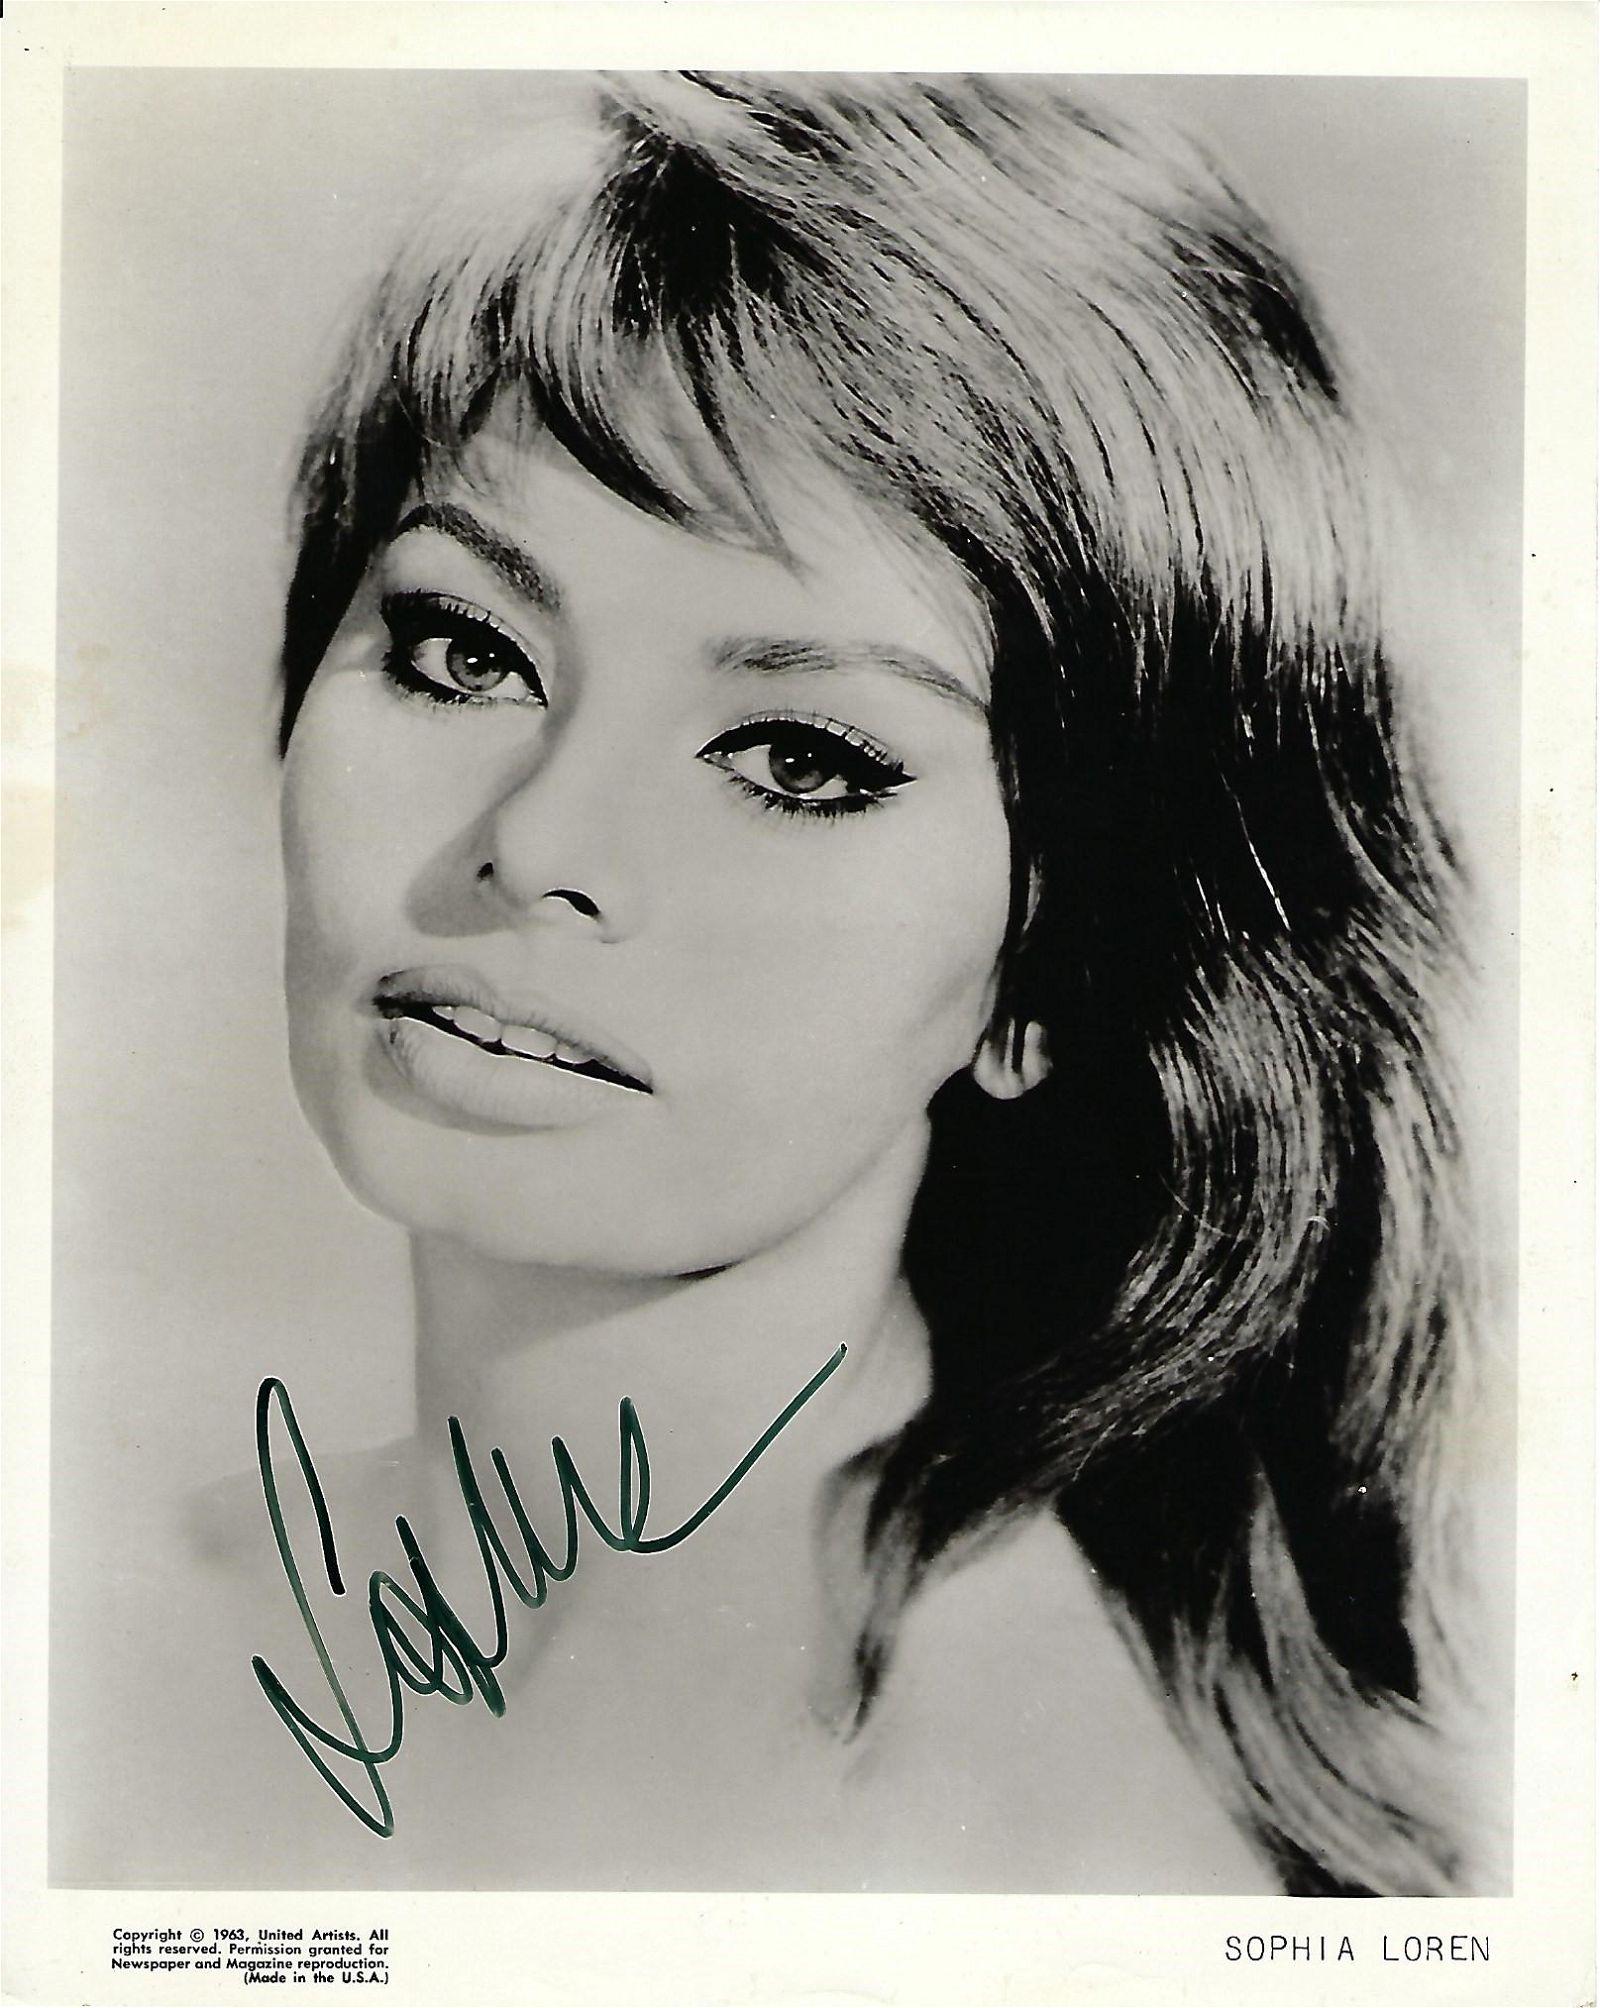 Sophia Loren Signed 10 x 8 inch b/w photo. Condition